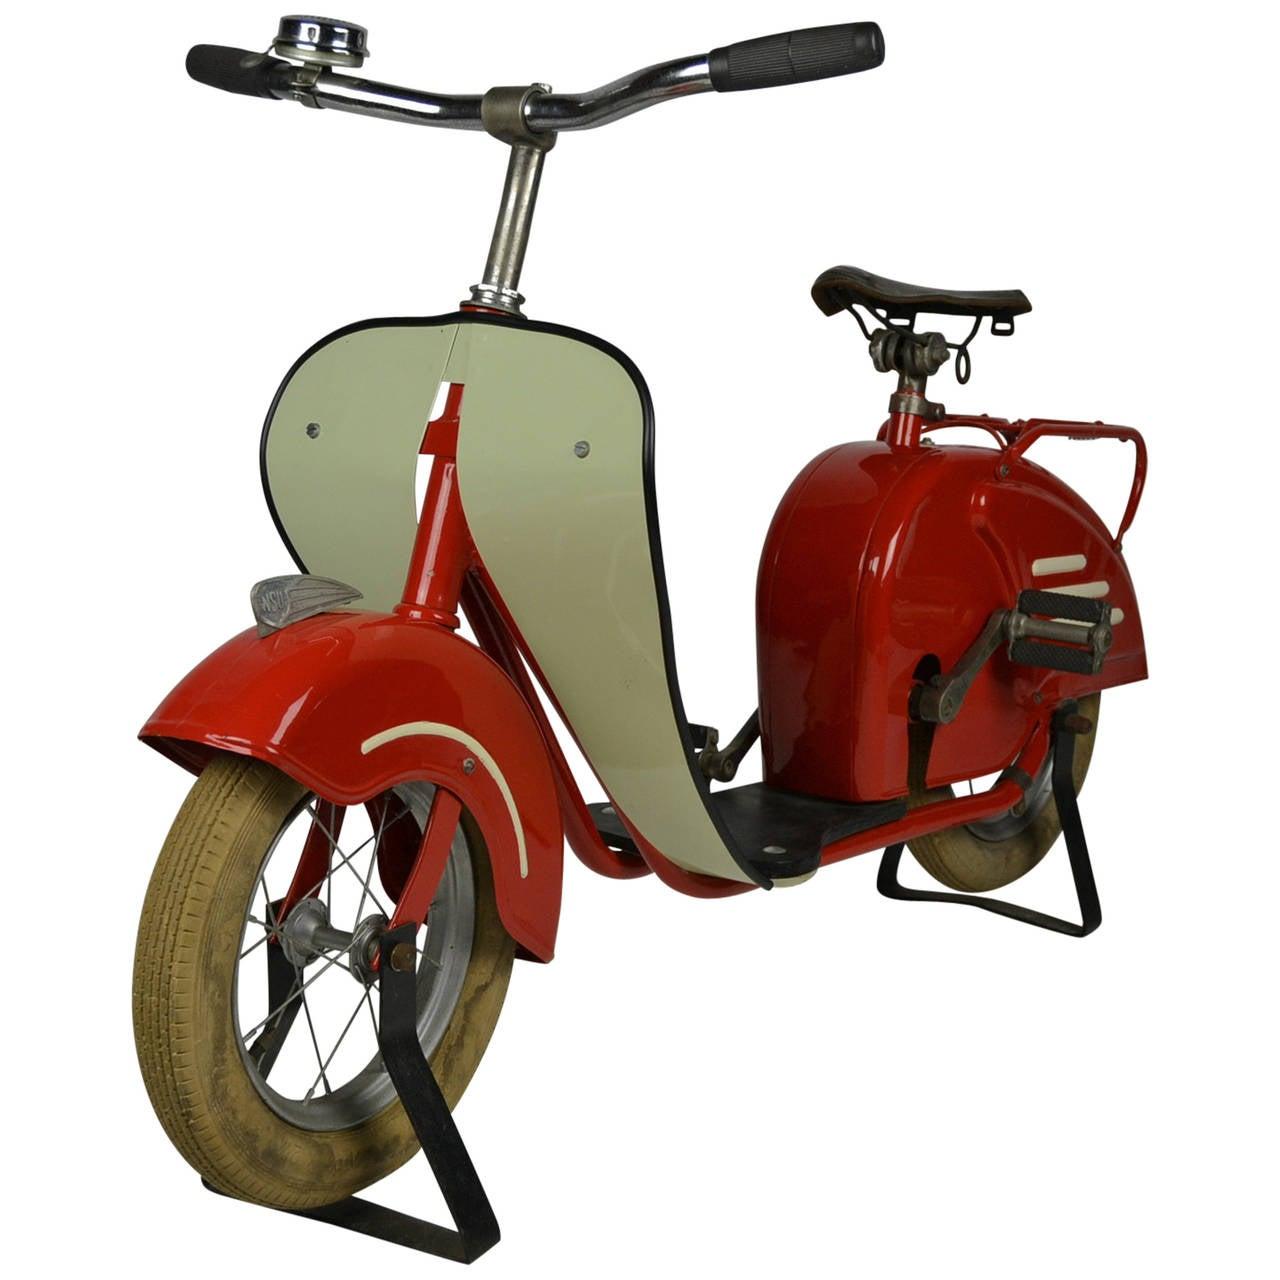 Carousel Pedal Scooter, circa 1950